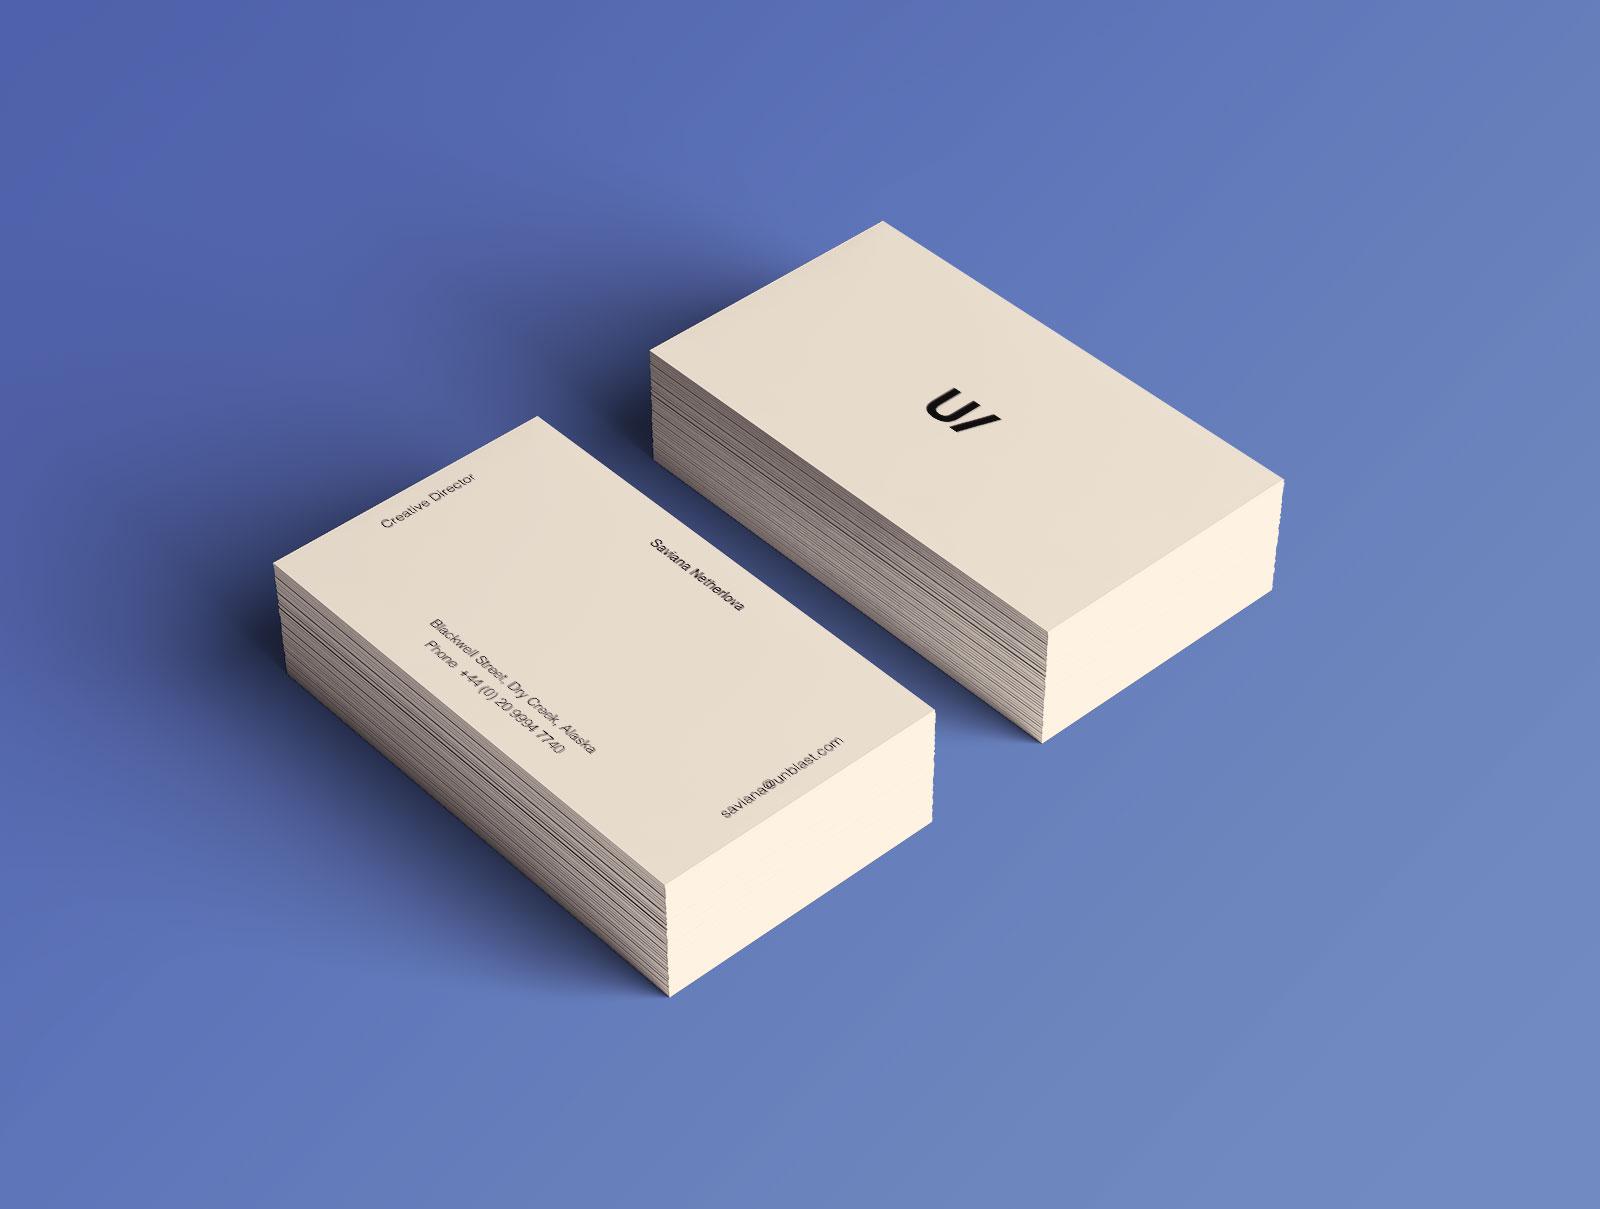 Free Professional Premium Corporate Identity Mockup PSD Set (5)